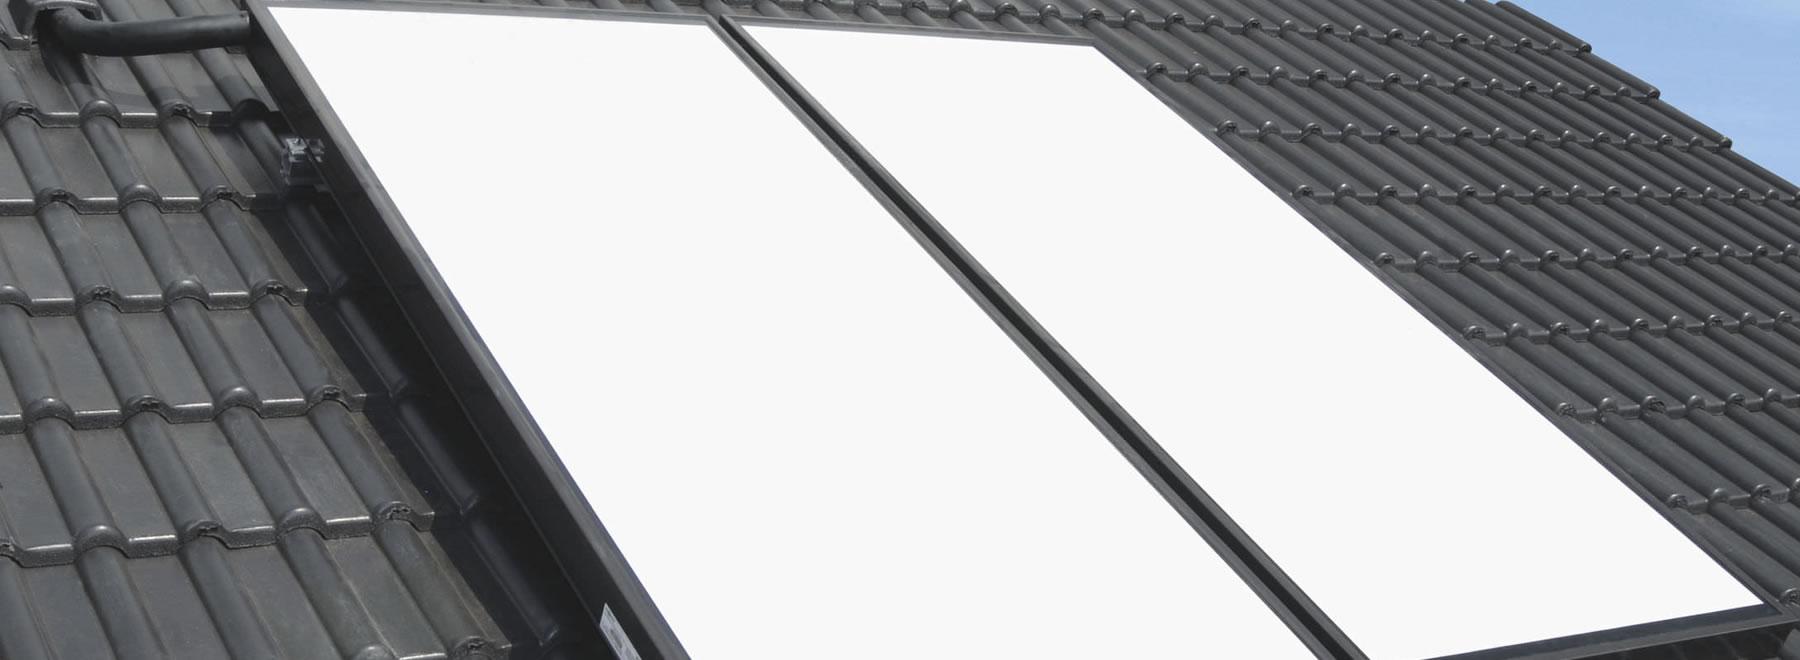 Solare termico slider